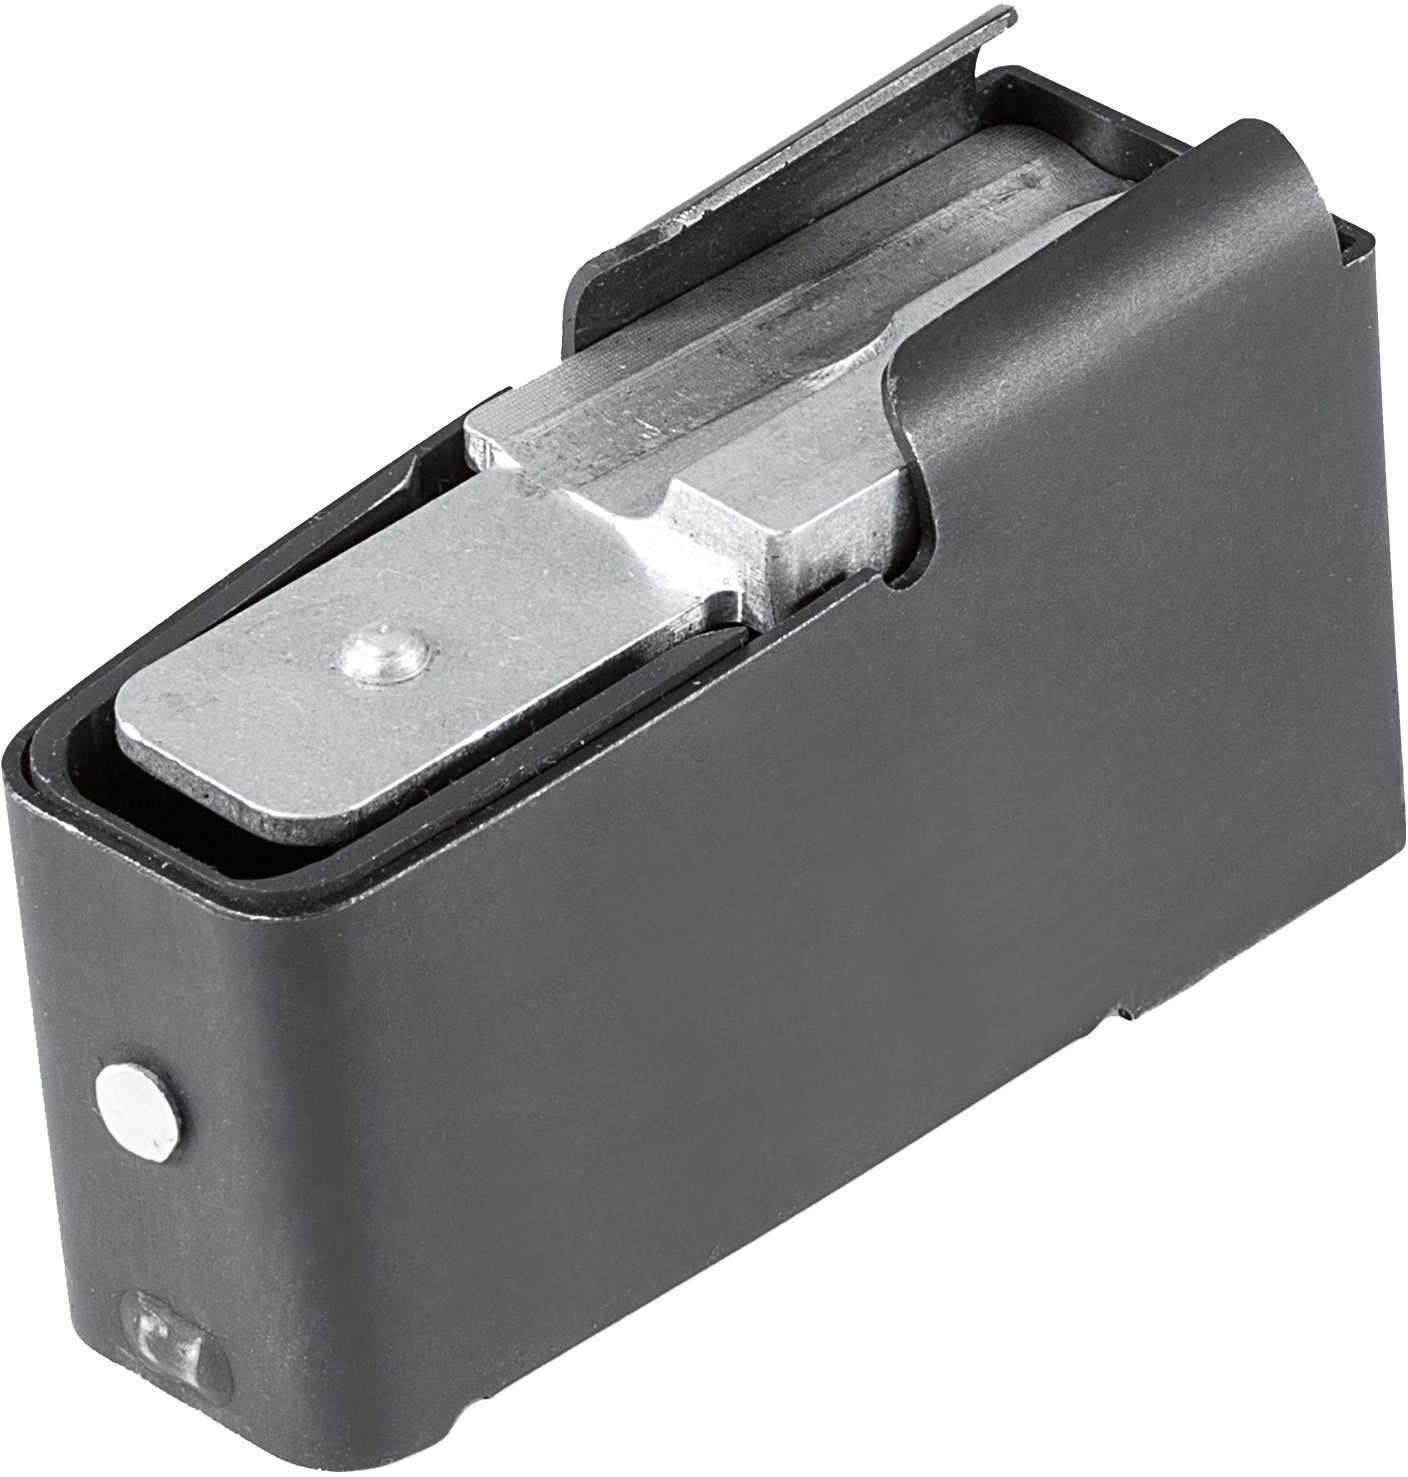 Browning 112022001 A-Bolt Shotgun 12 Gauge 2 Round Steel Black Finish